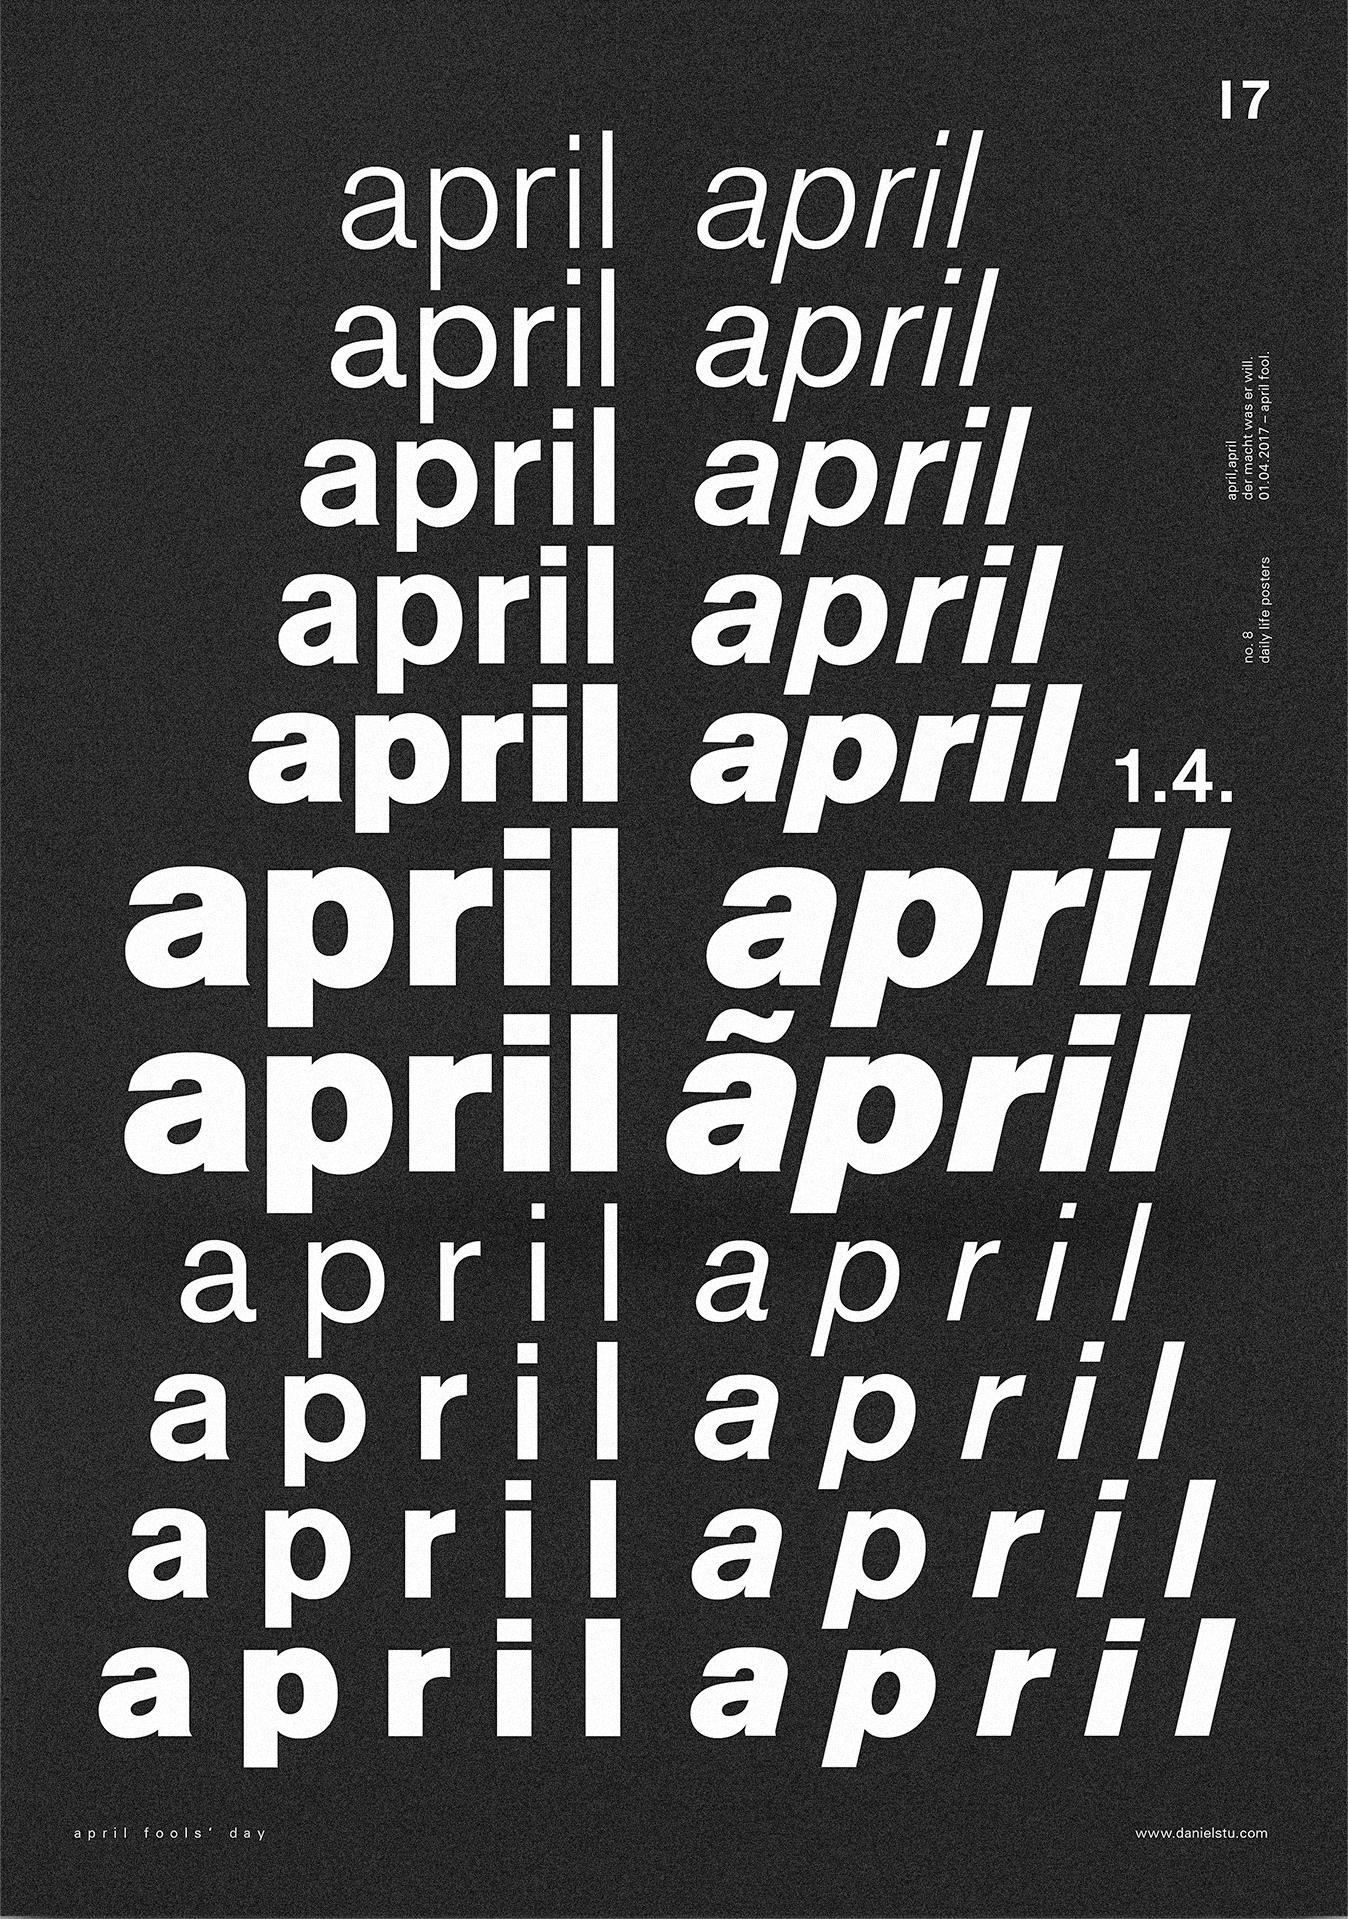 April-April